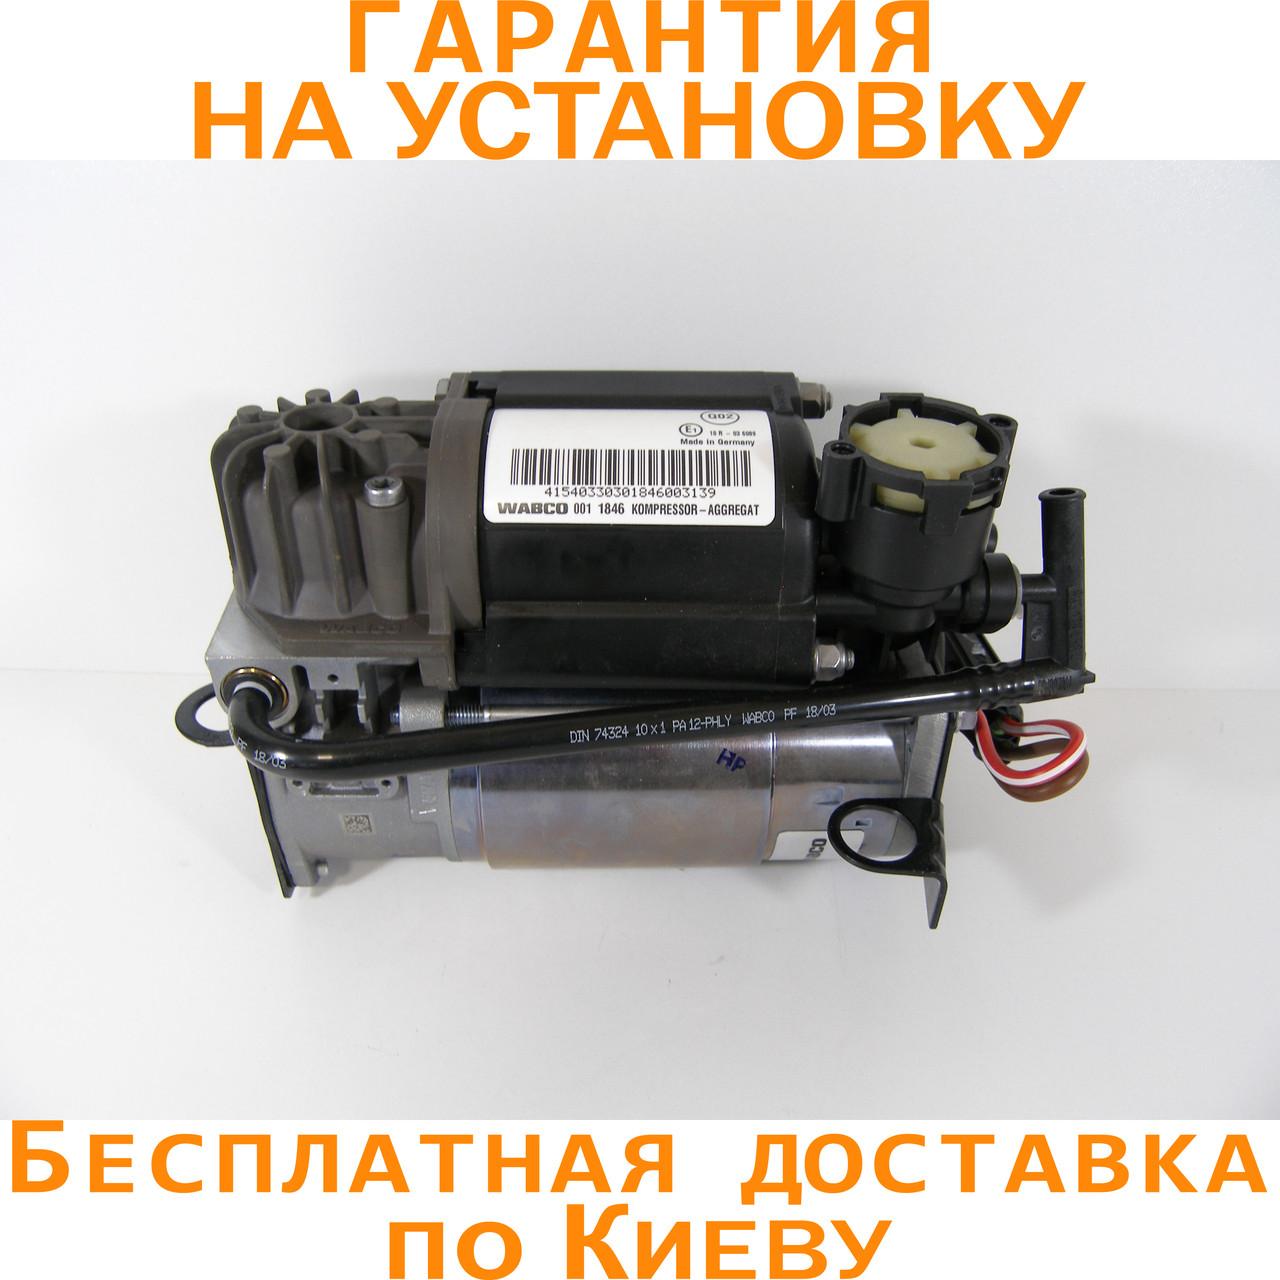 Компрессор пневмоподвески VolksWagen Phaeton Wabco